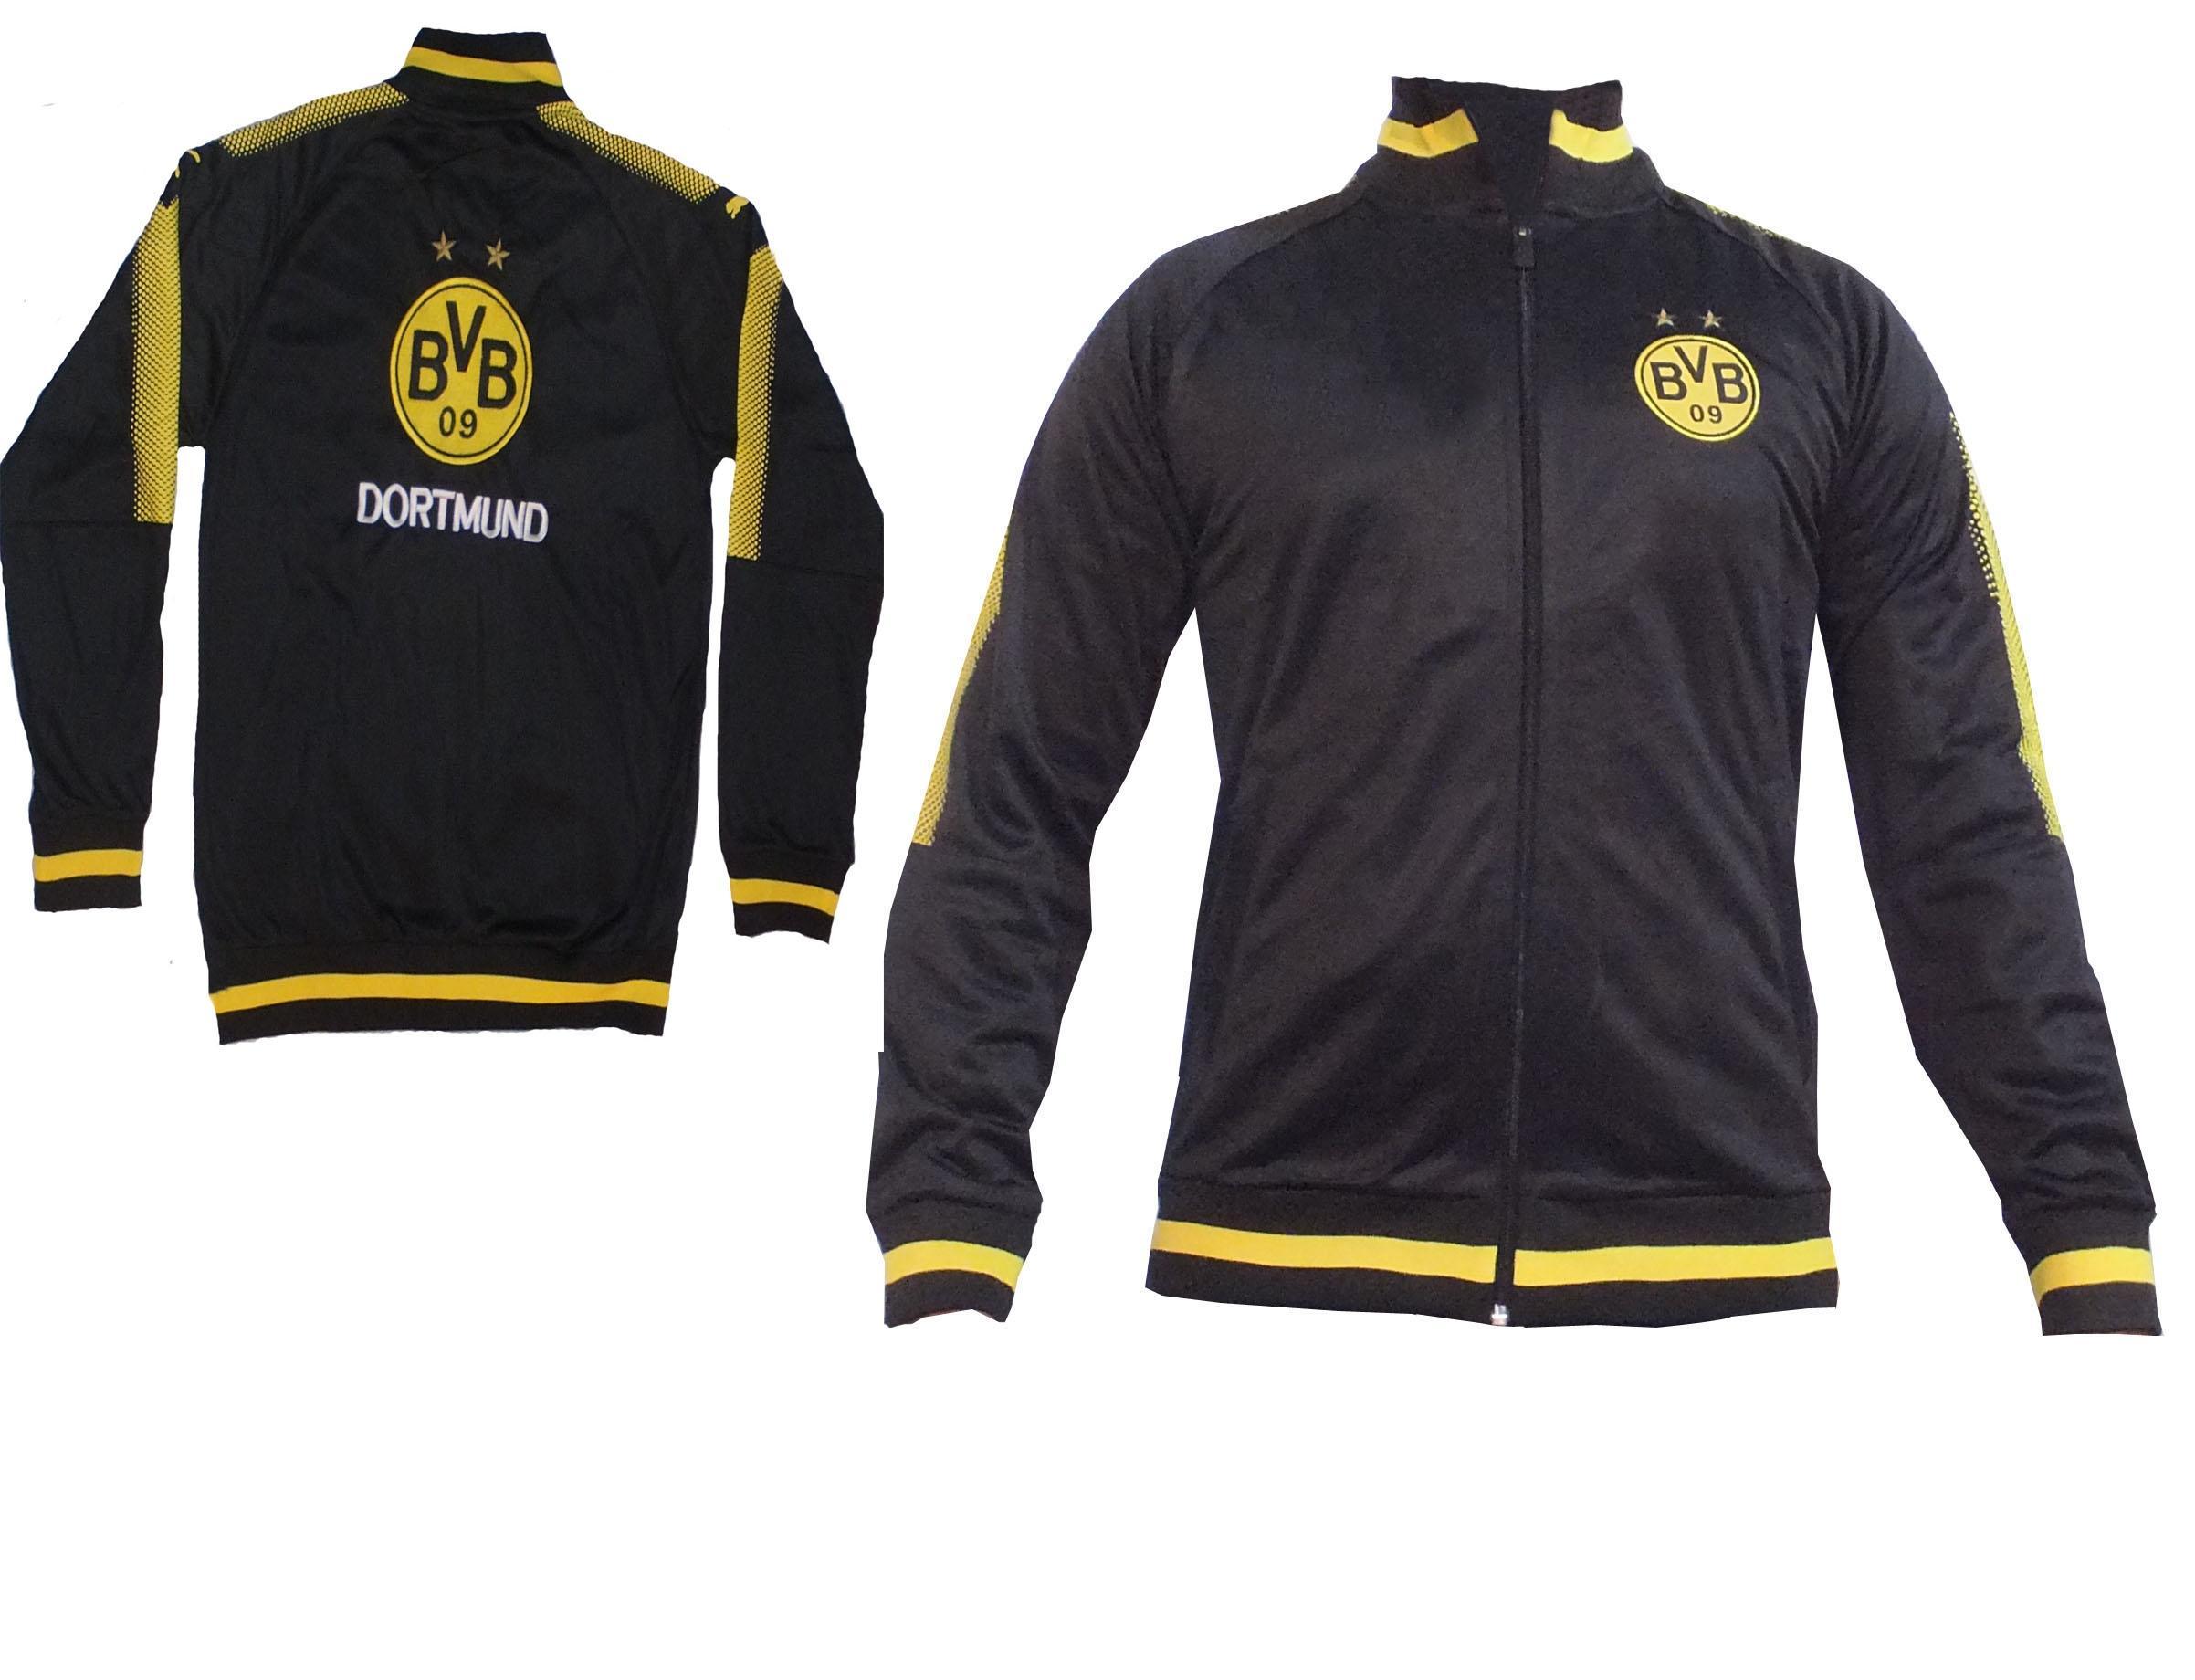 Dortmund Football Club Jacket